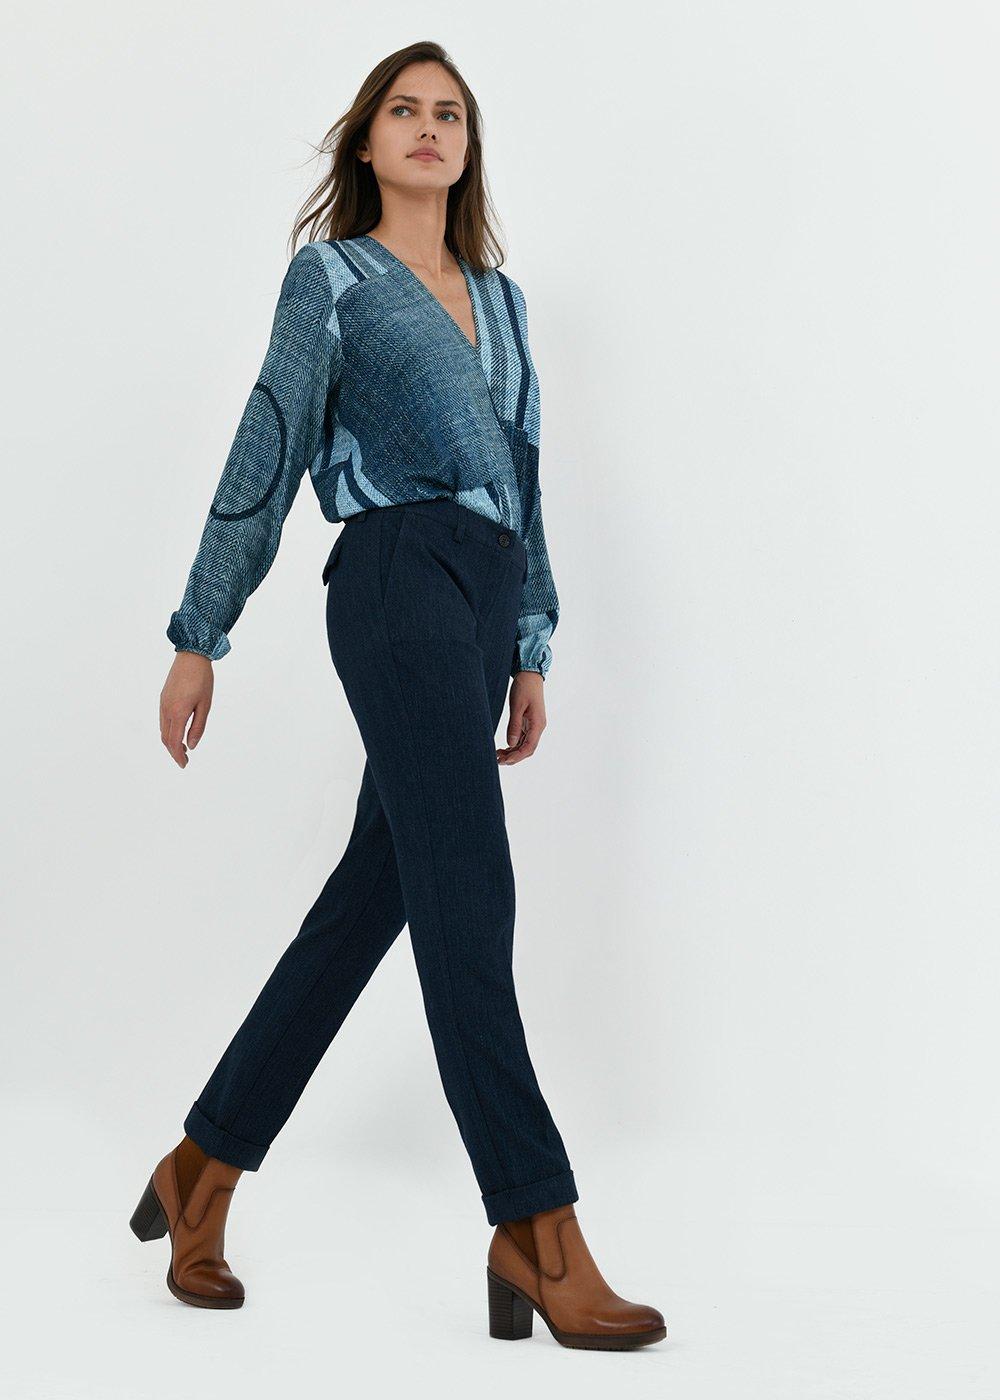 Pantalone Bella effetto denim - Blue - Donna